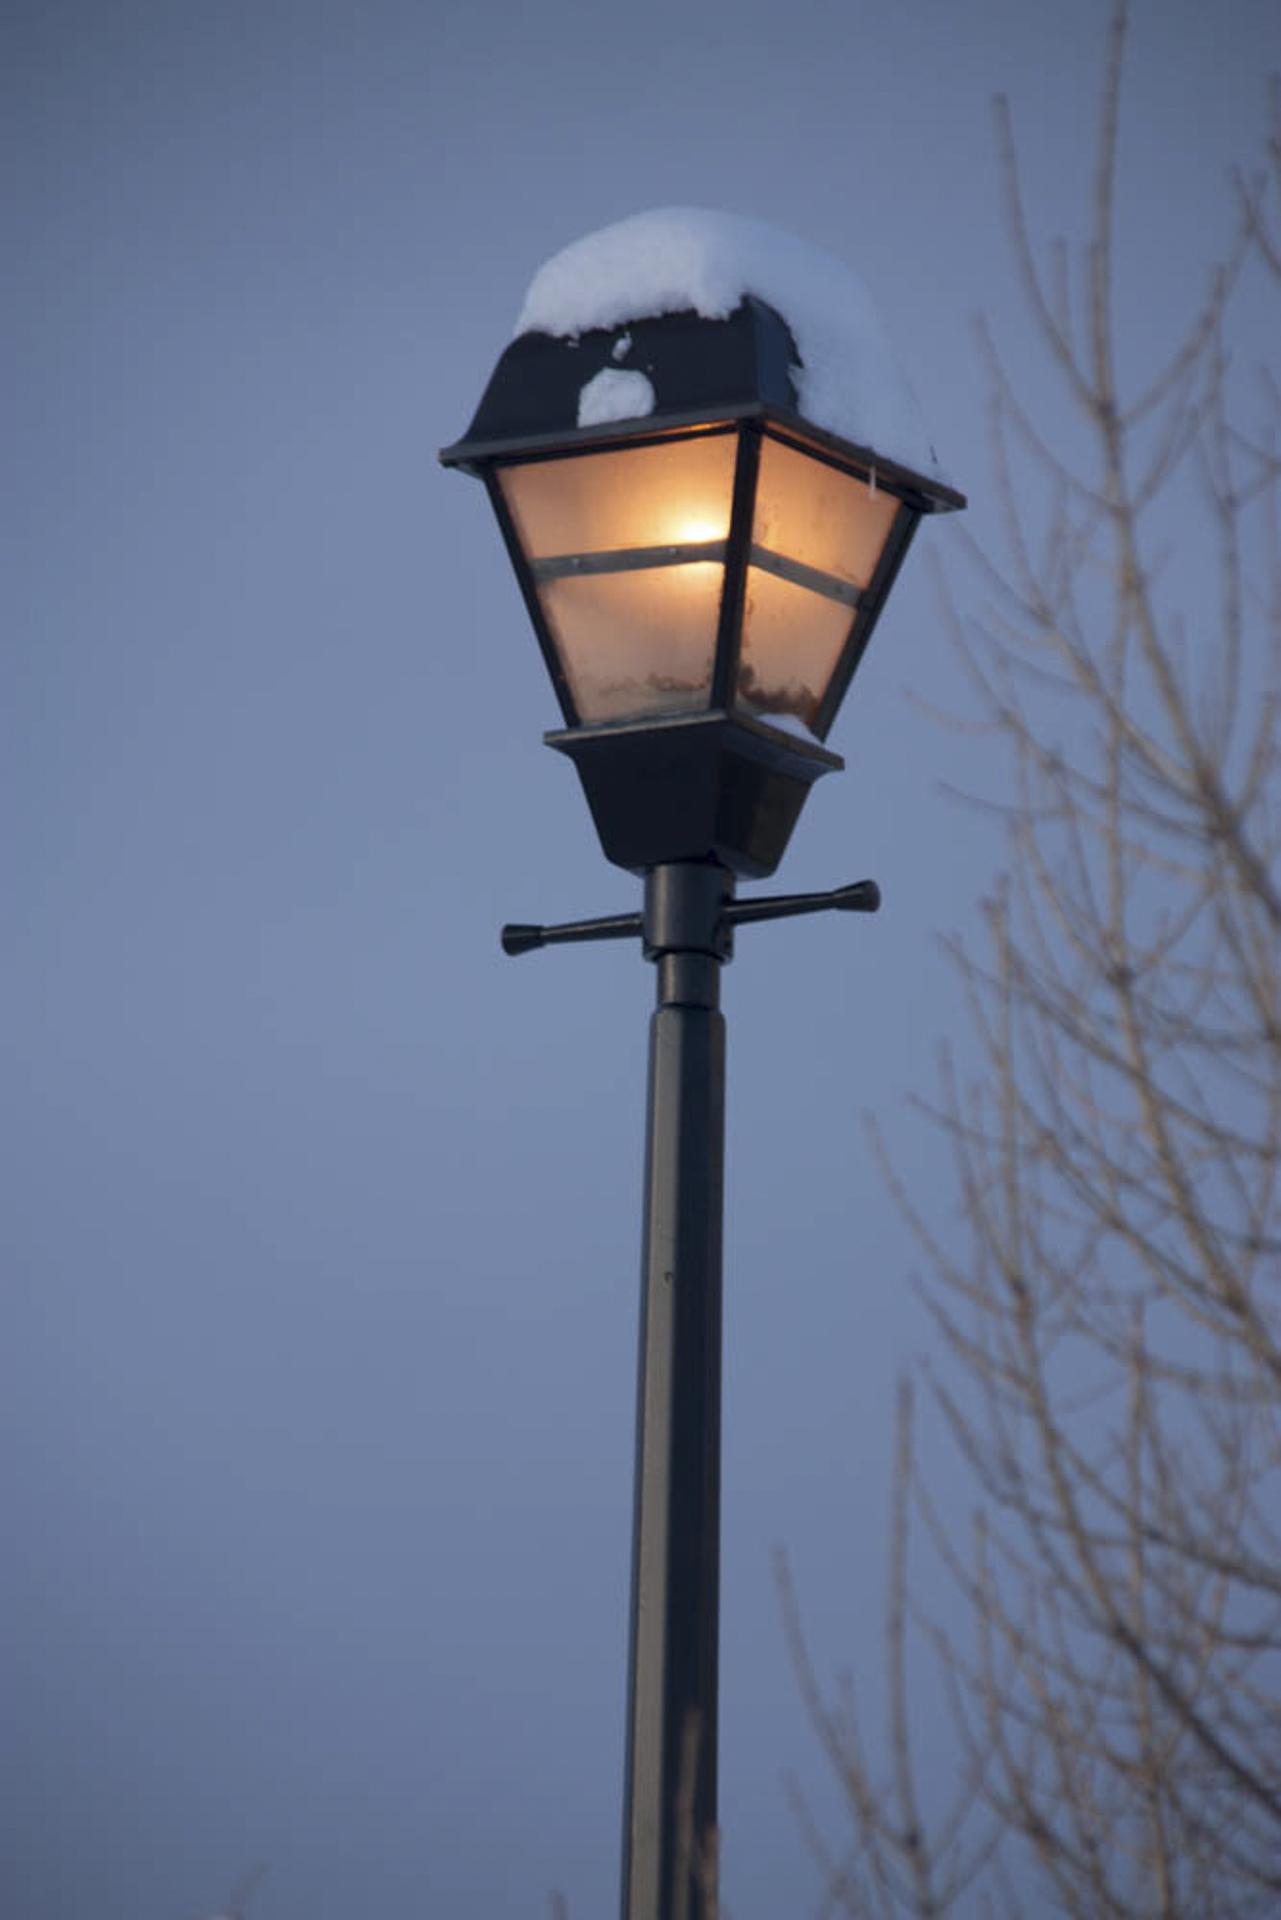 lamp post-2 - ©AnnMarie Brown